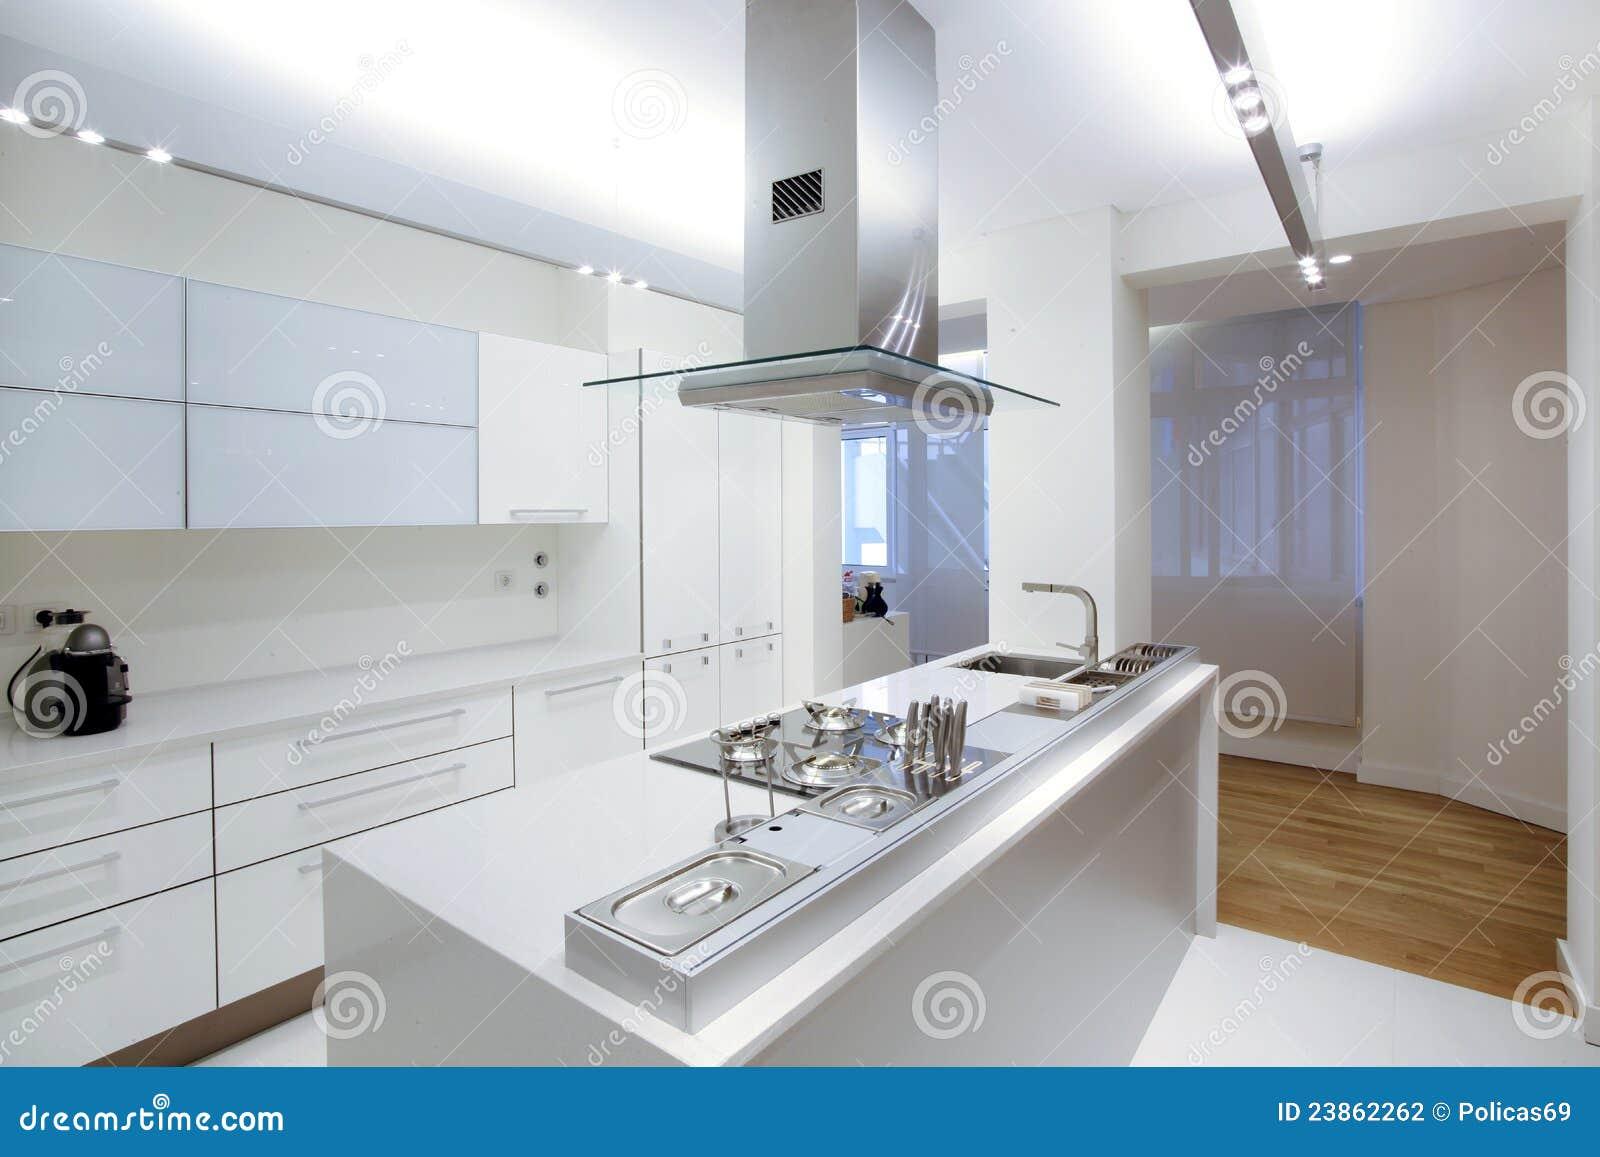 Moderne witte keuken met houten vloer stock foto afbeelding 23862262 - Witte keukens houten ...